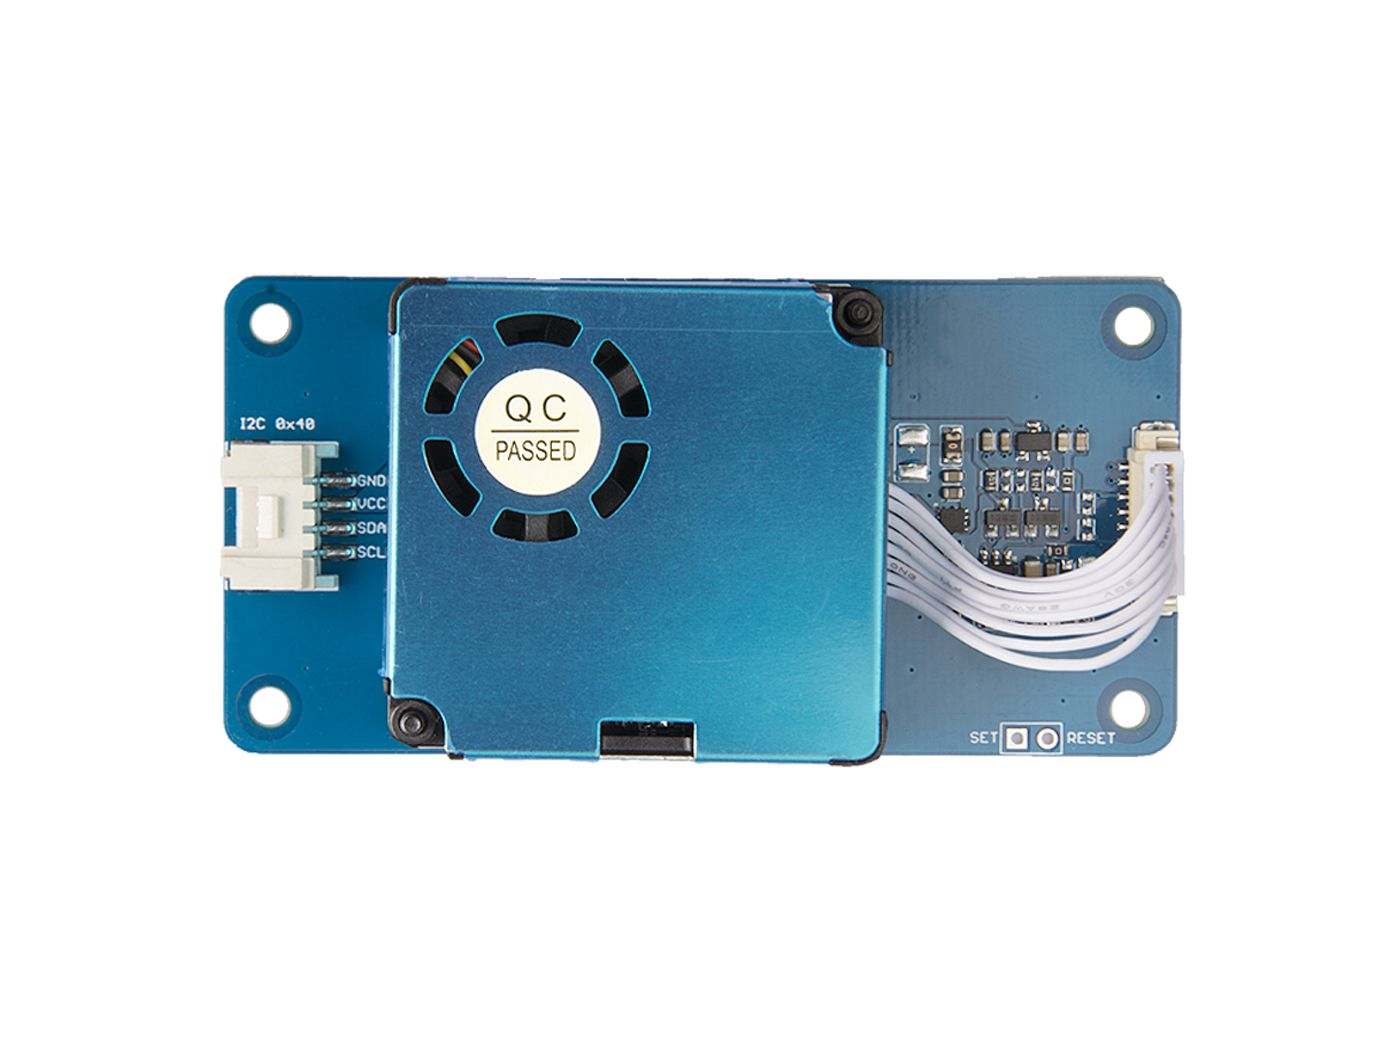 Grove - Laser PM2 5 Sensor (HM3301) โมดูลเซ็นเซอร์วัดฝุ่น PM2 5 (แถม